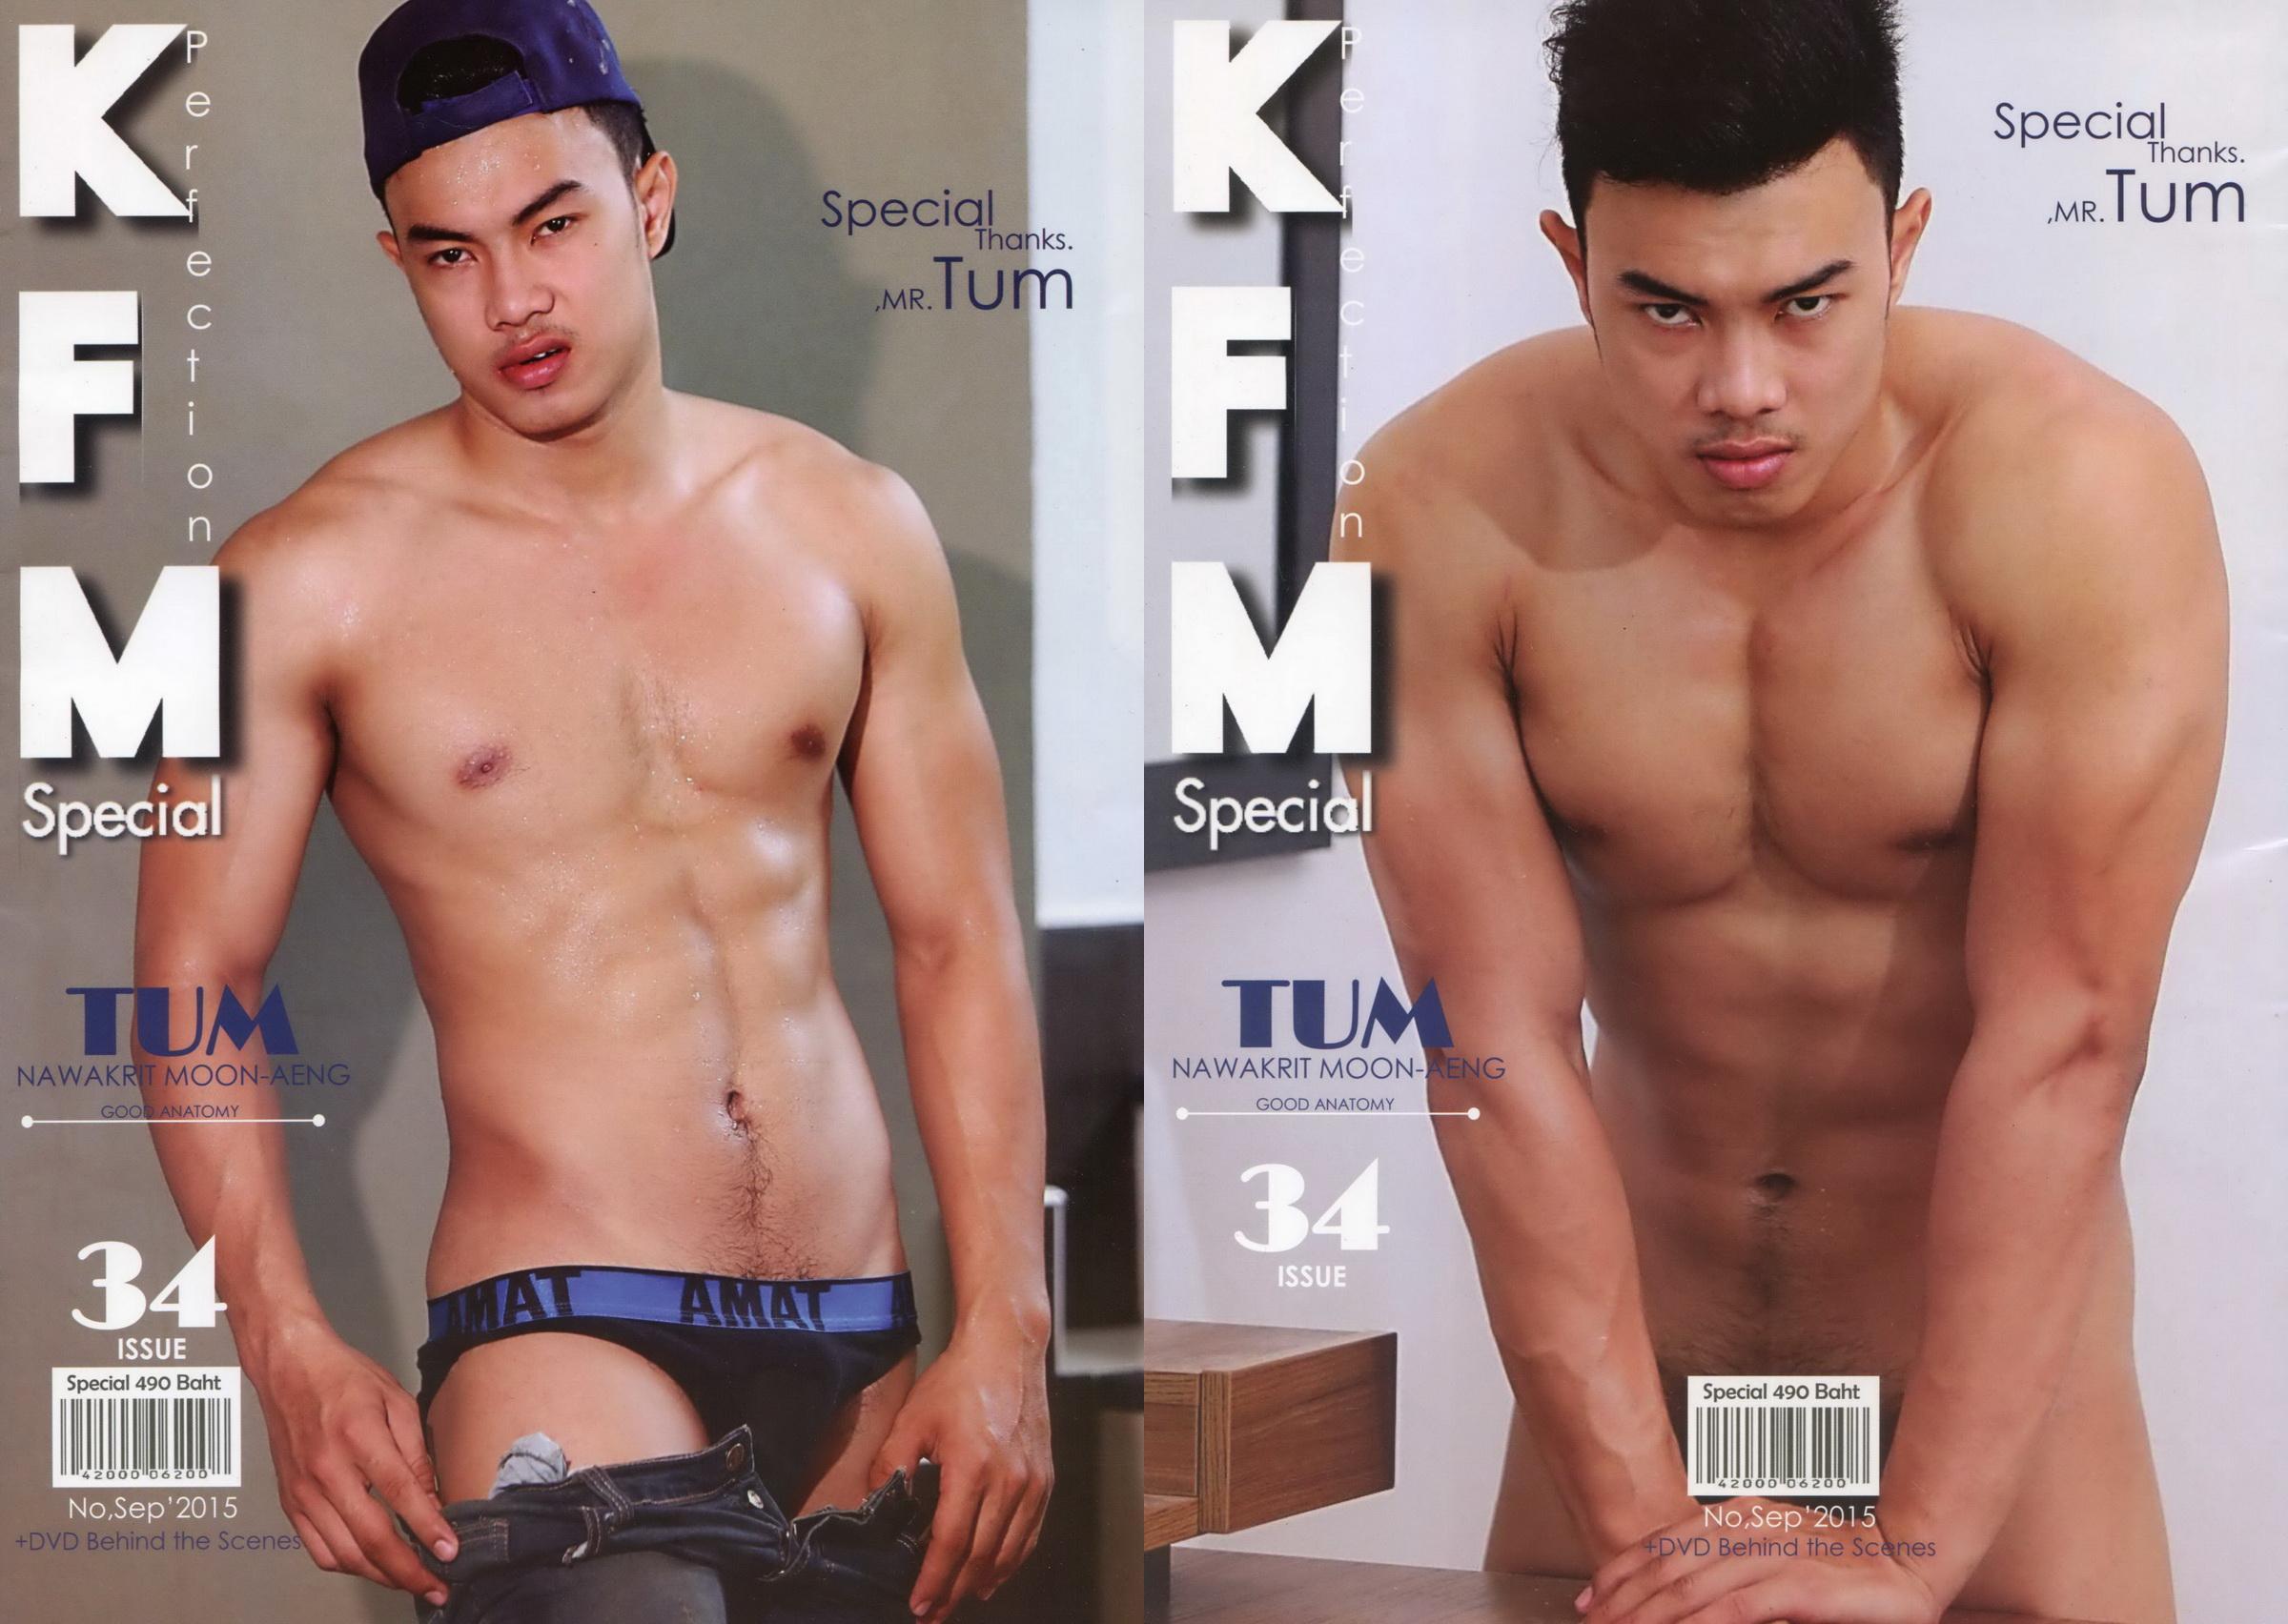 [THAI] KFM SPECIAL vol. 3 no. 33 SEPTEMBER 2015: TUM NAWAKRIT MOON-AENG